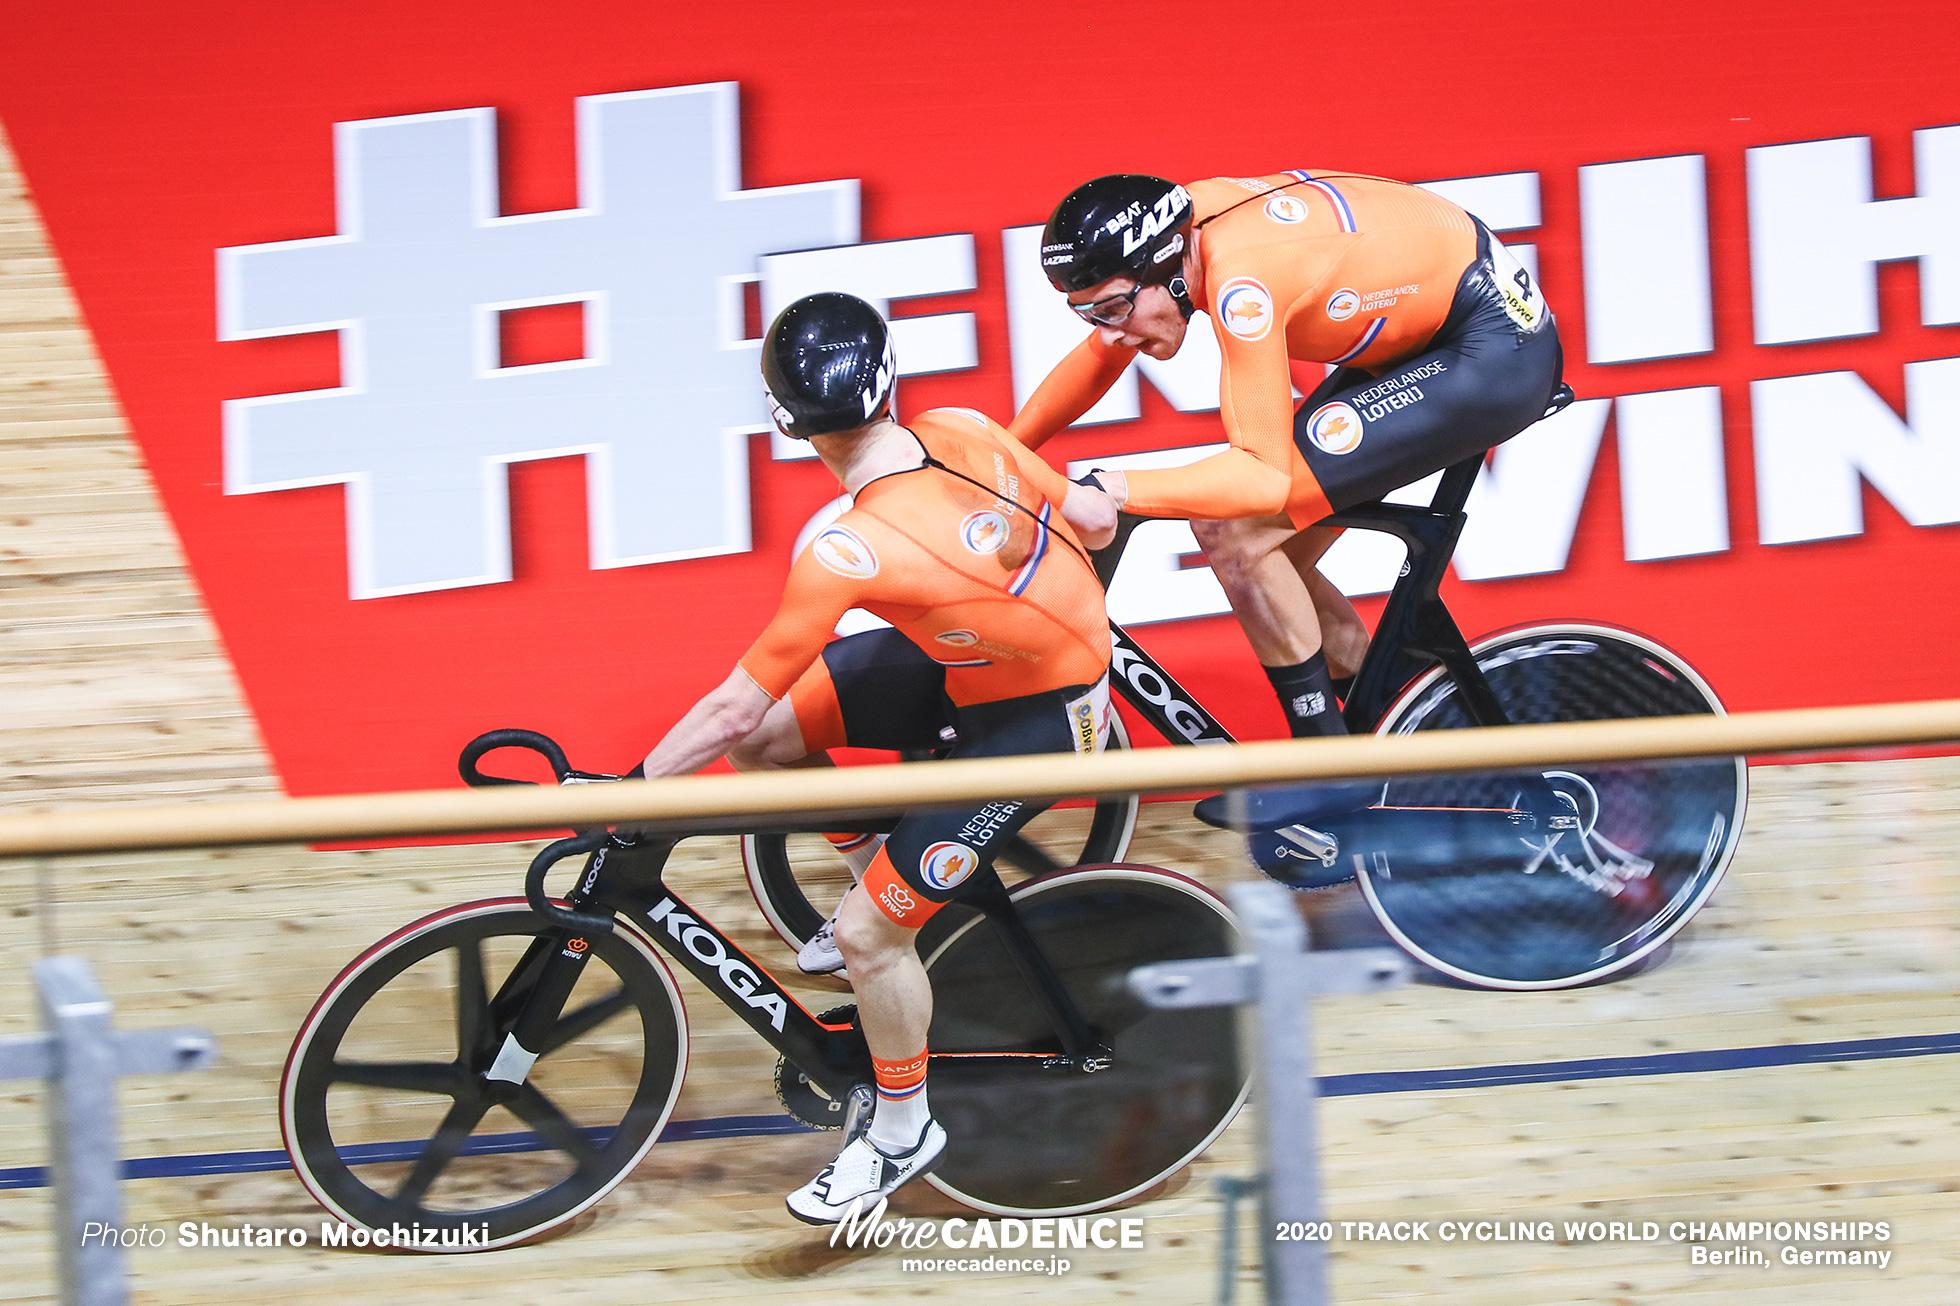 Men's Madison / 2020 Track Cycling World Championships